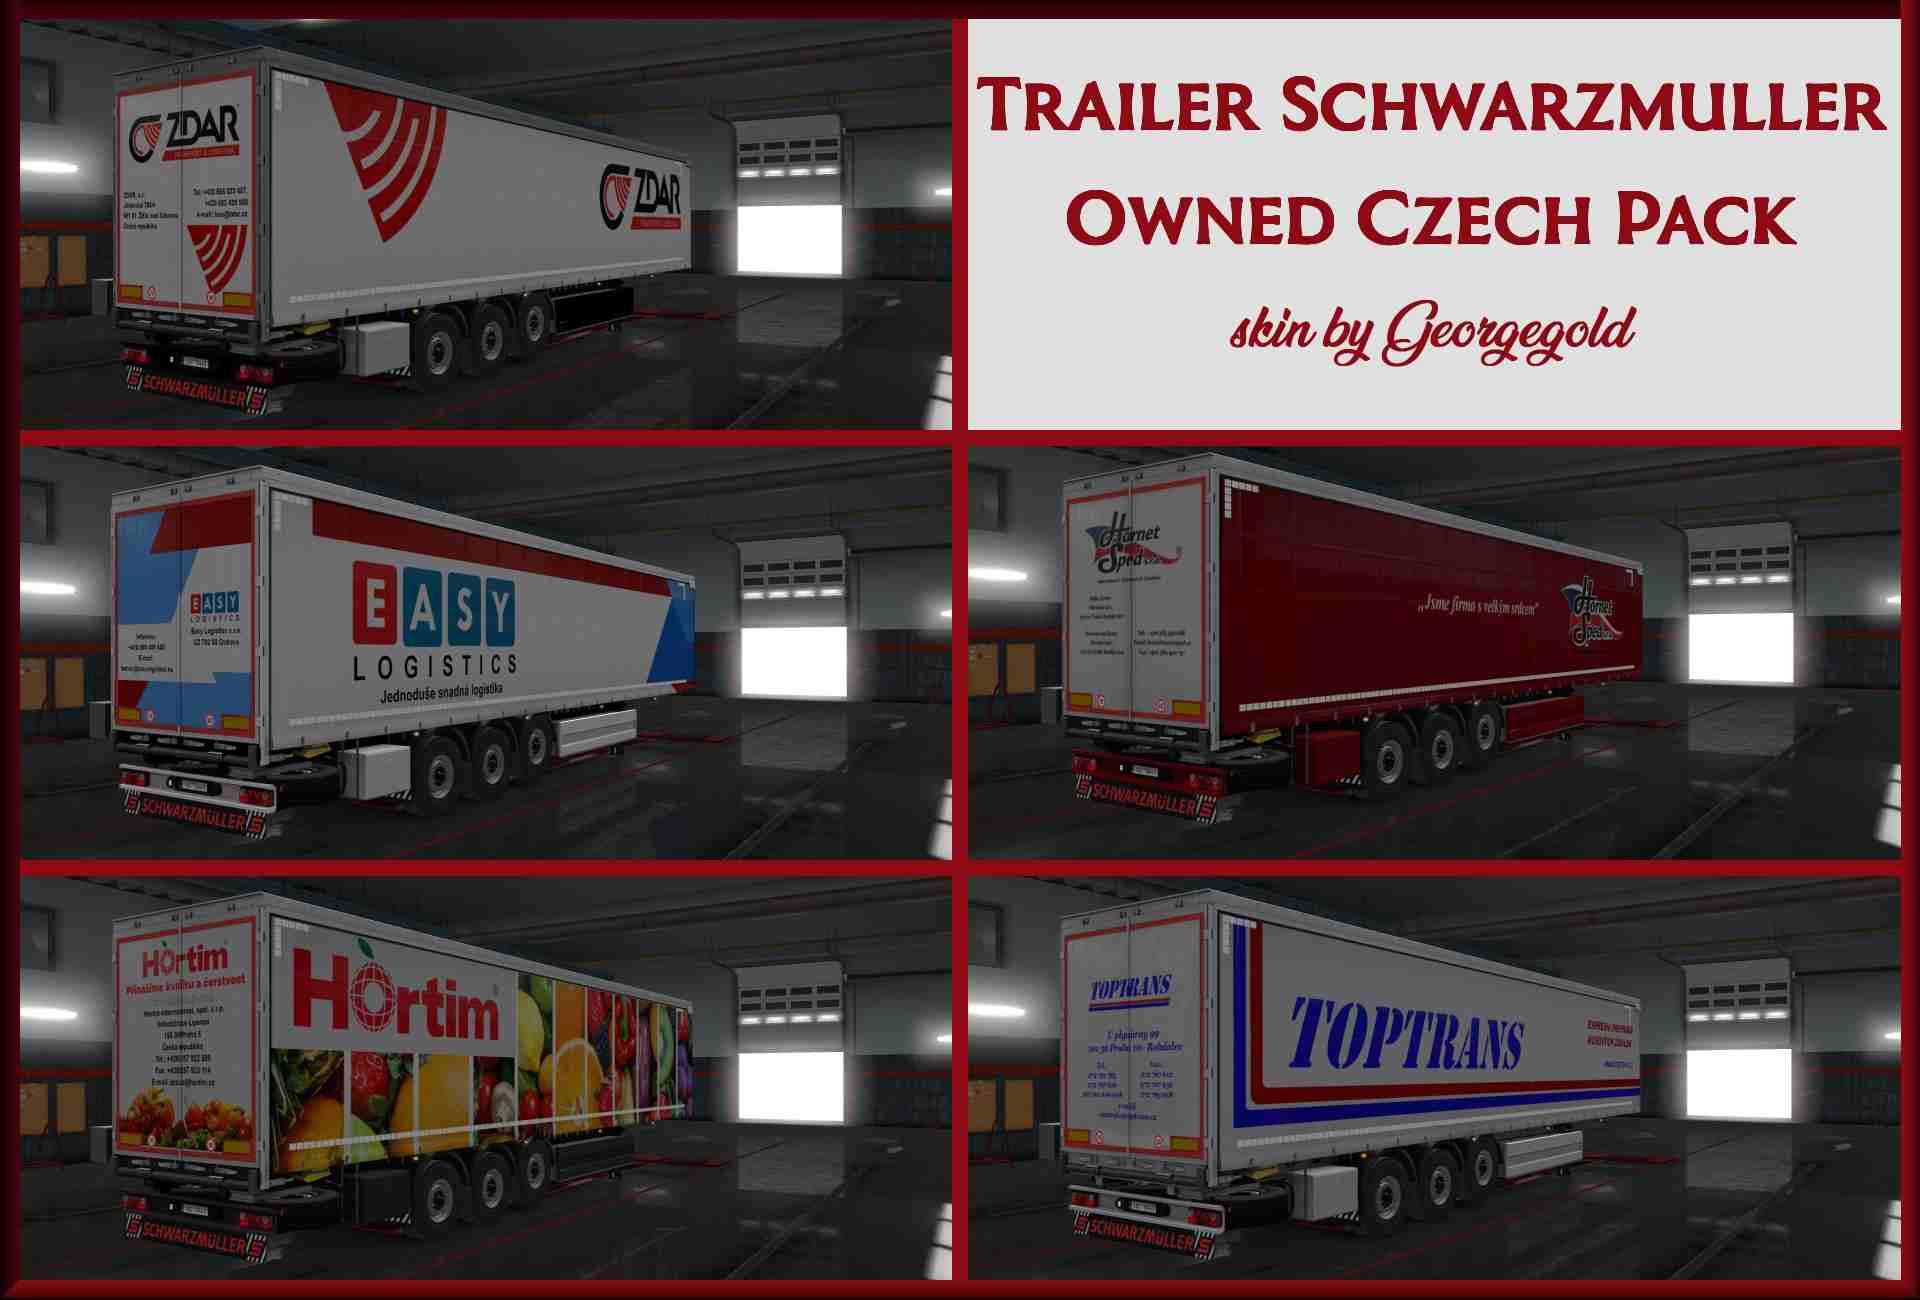 Trailer Schwarzmuller Owned Czech Pack